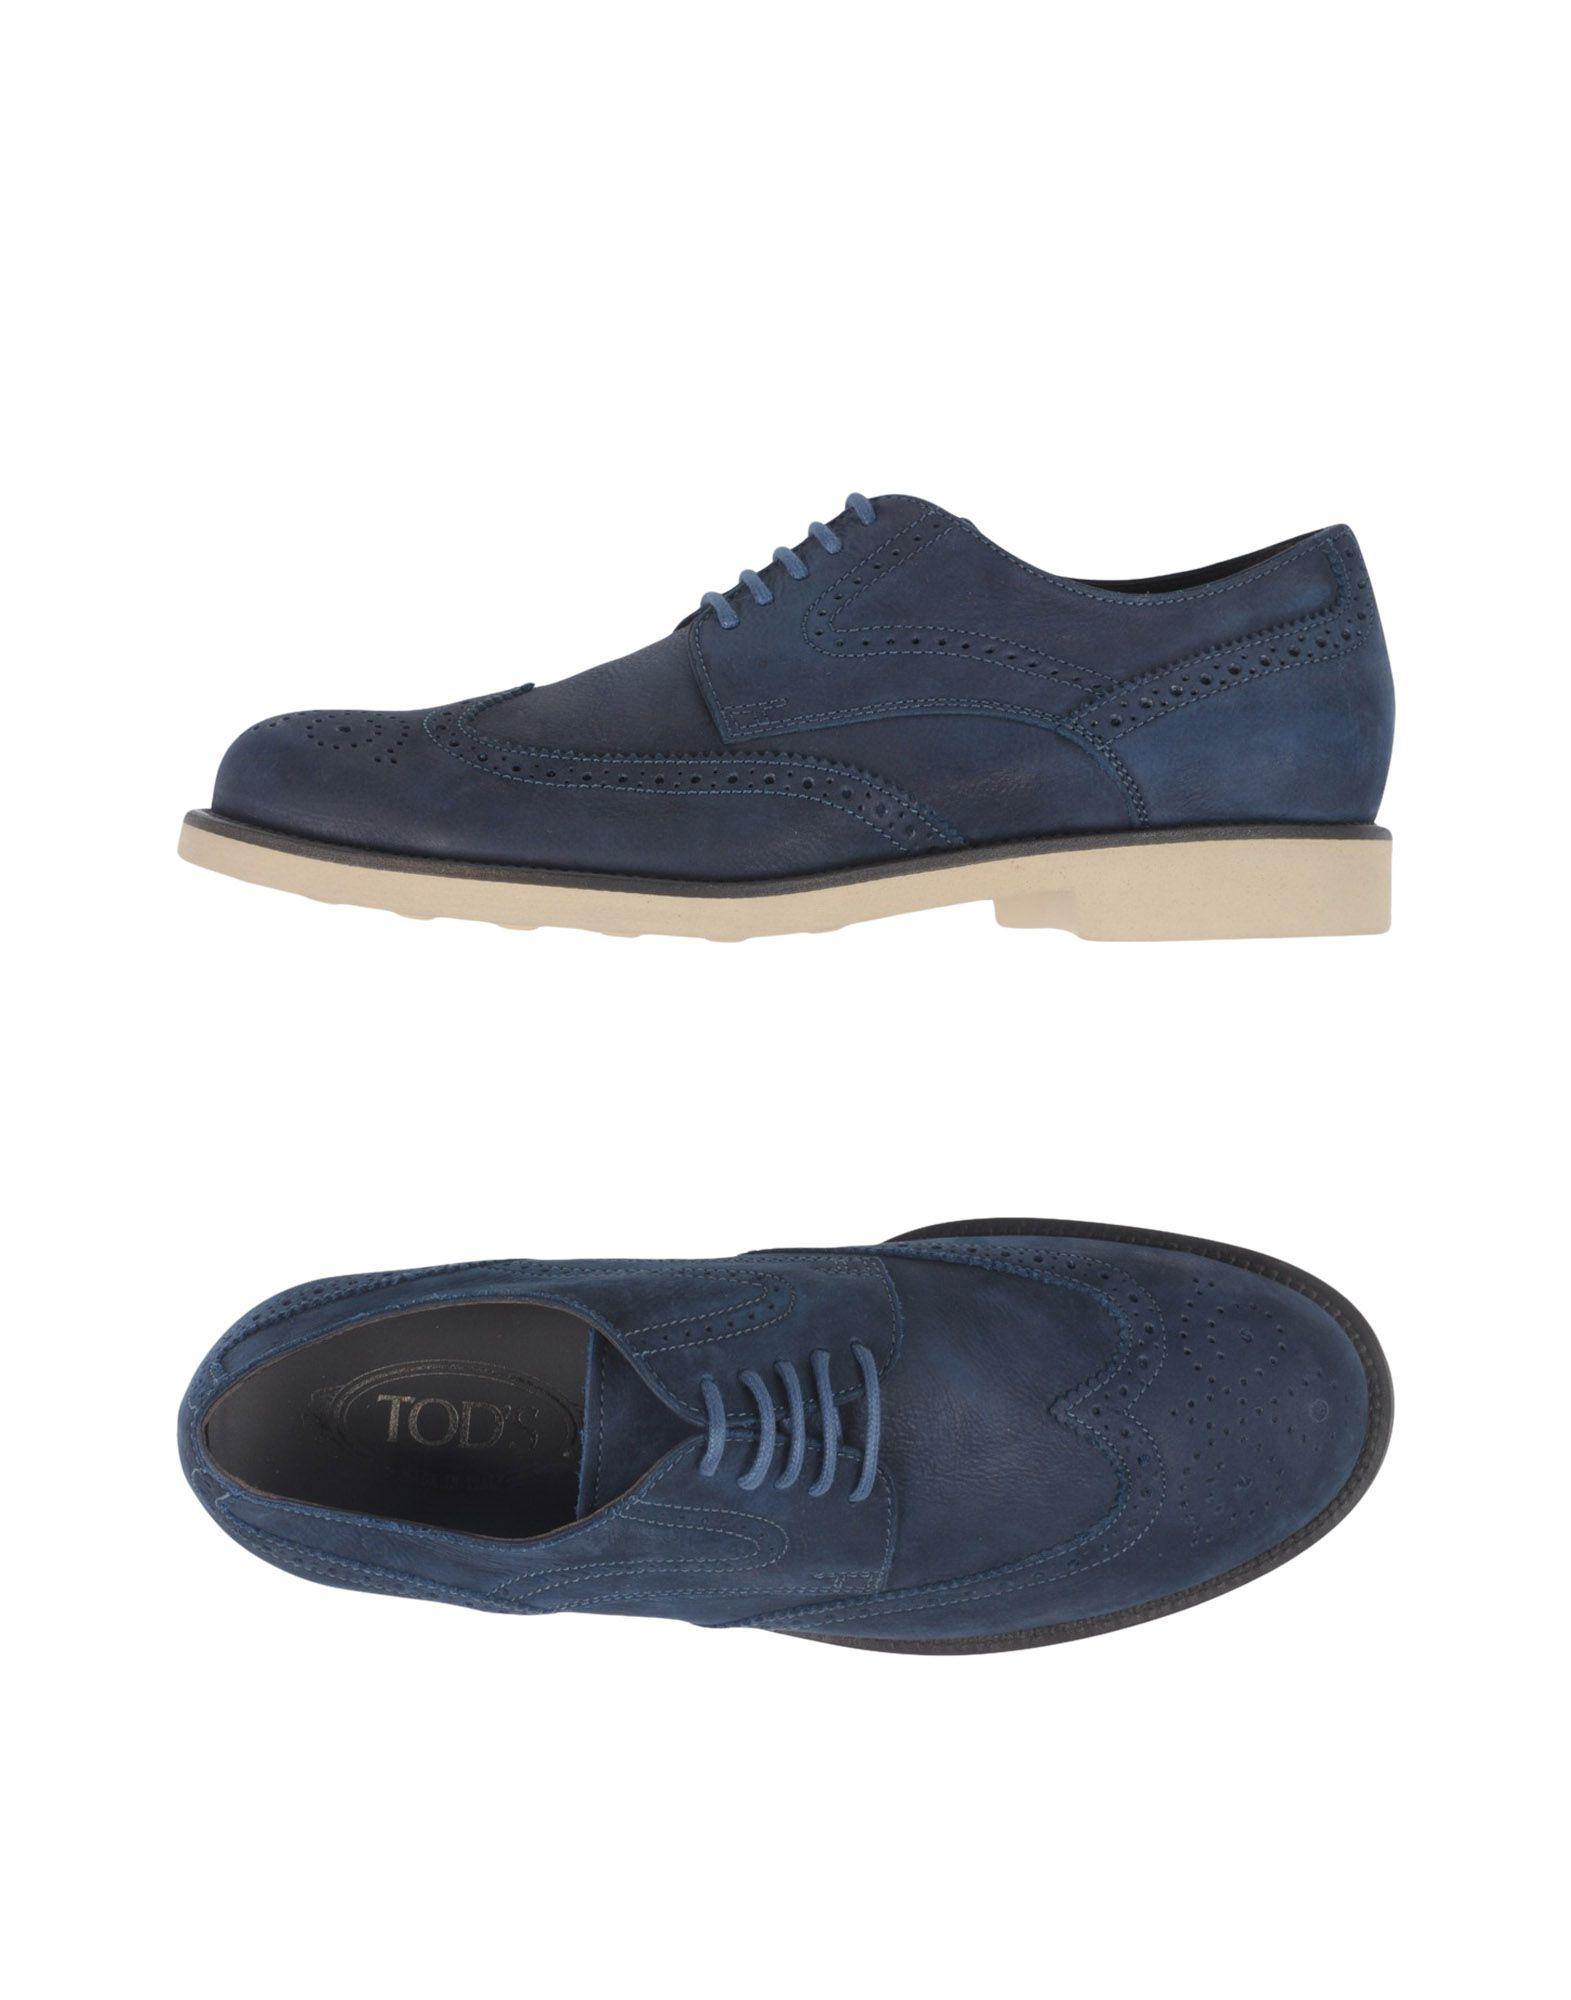 Tod's Gute Schnürschuhe Herren  11319287BS Gute Tod's Qualität beliebte Schuhe fbba96